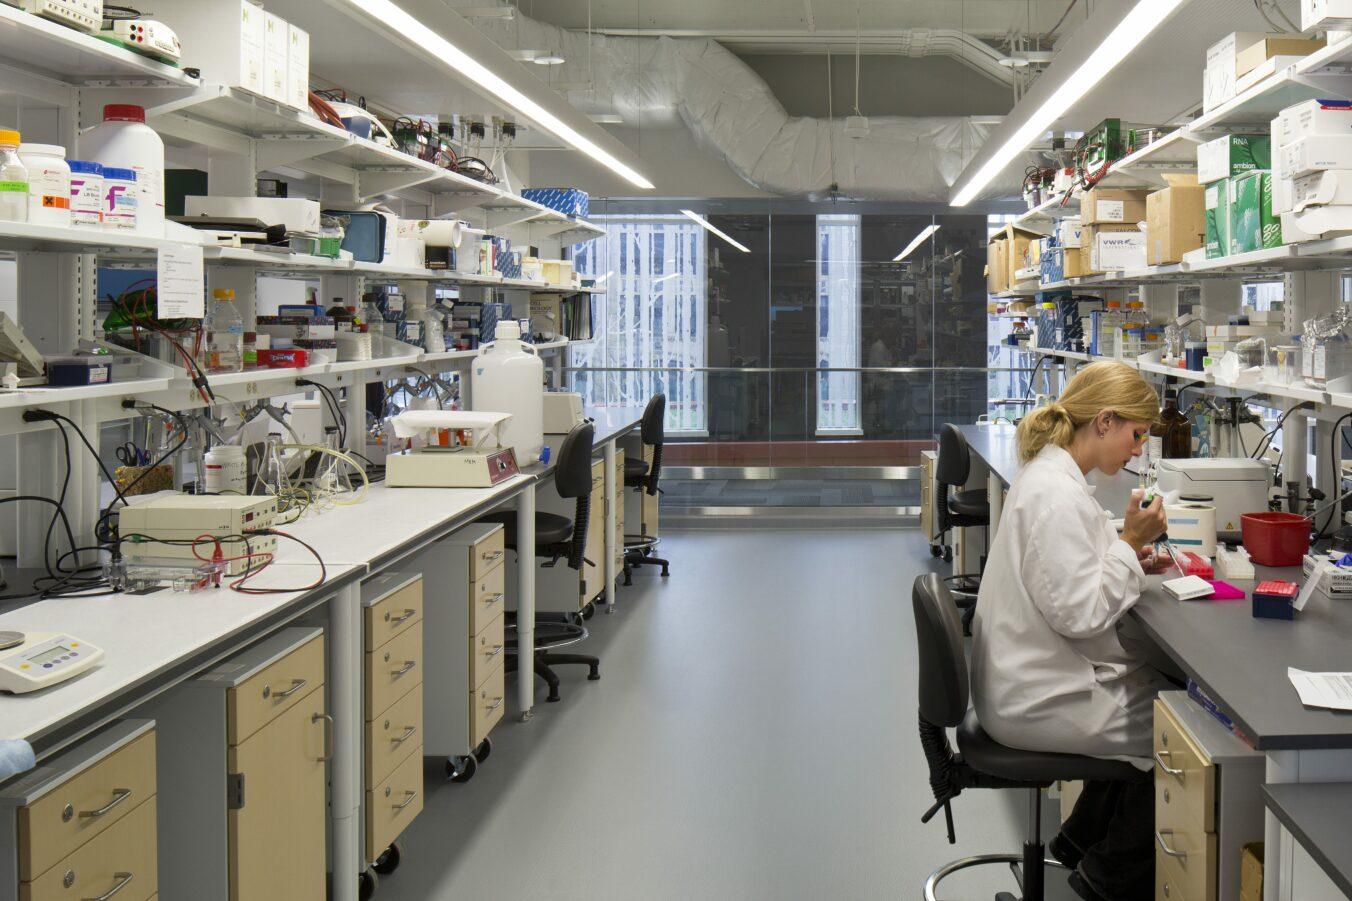 Wayne State University iBio Laboratory